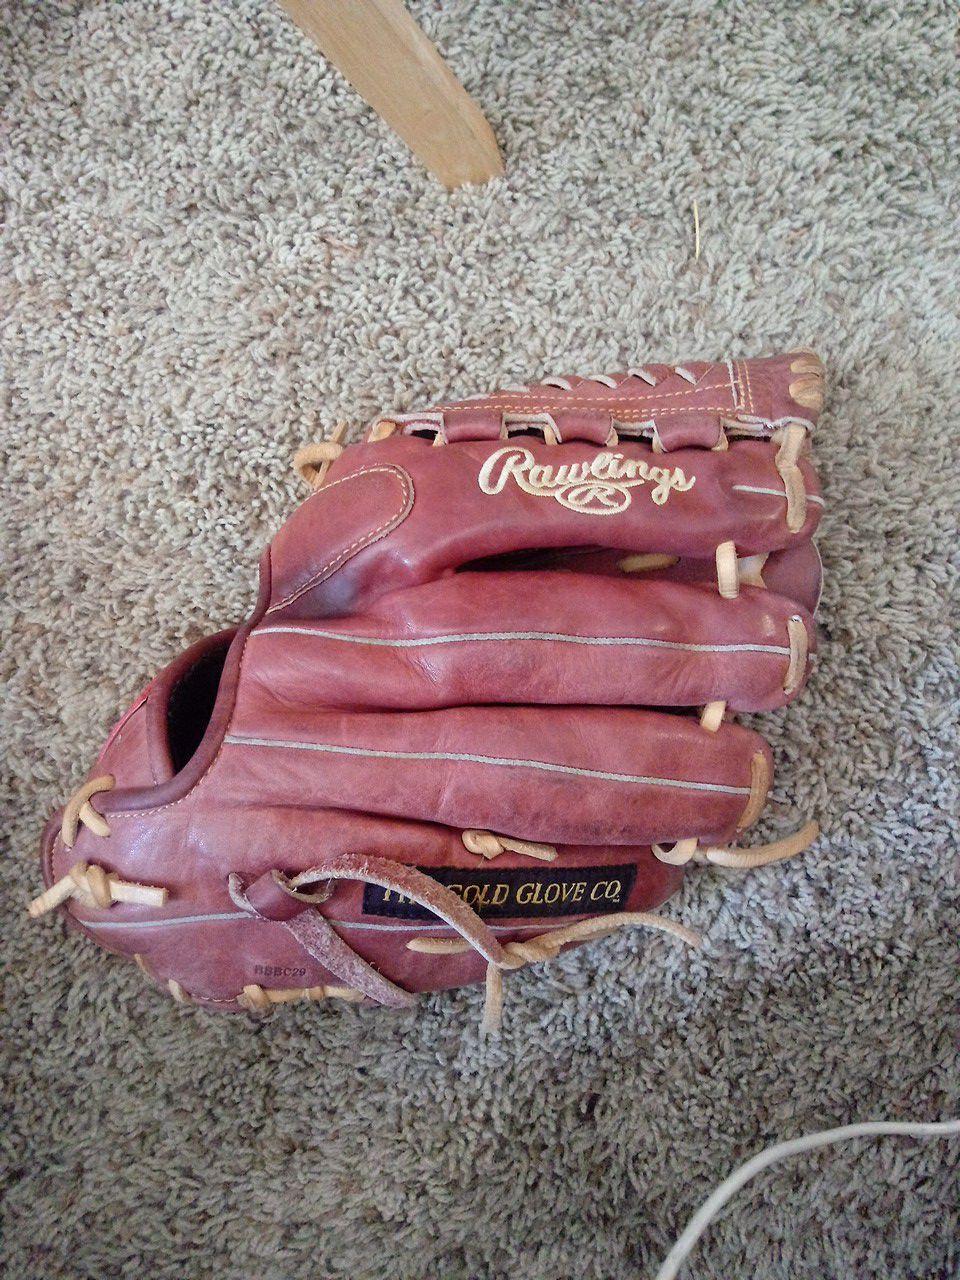 Rawlings baseball glove. Left handed